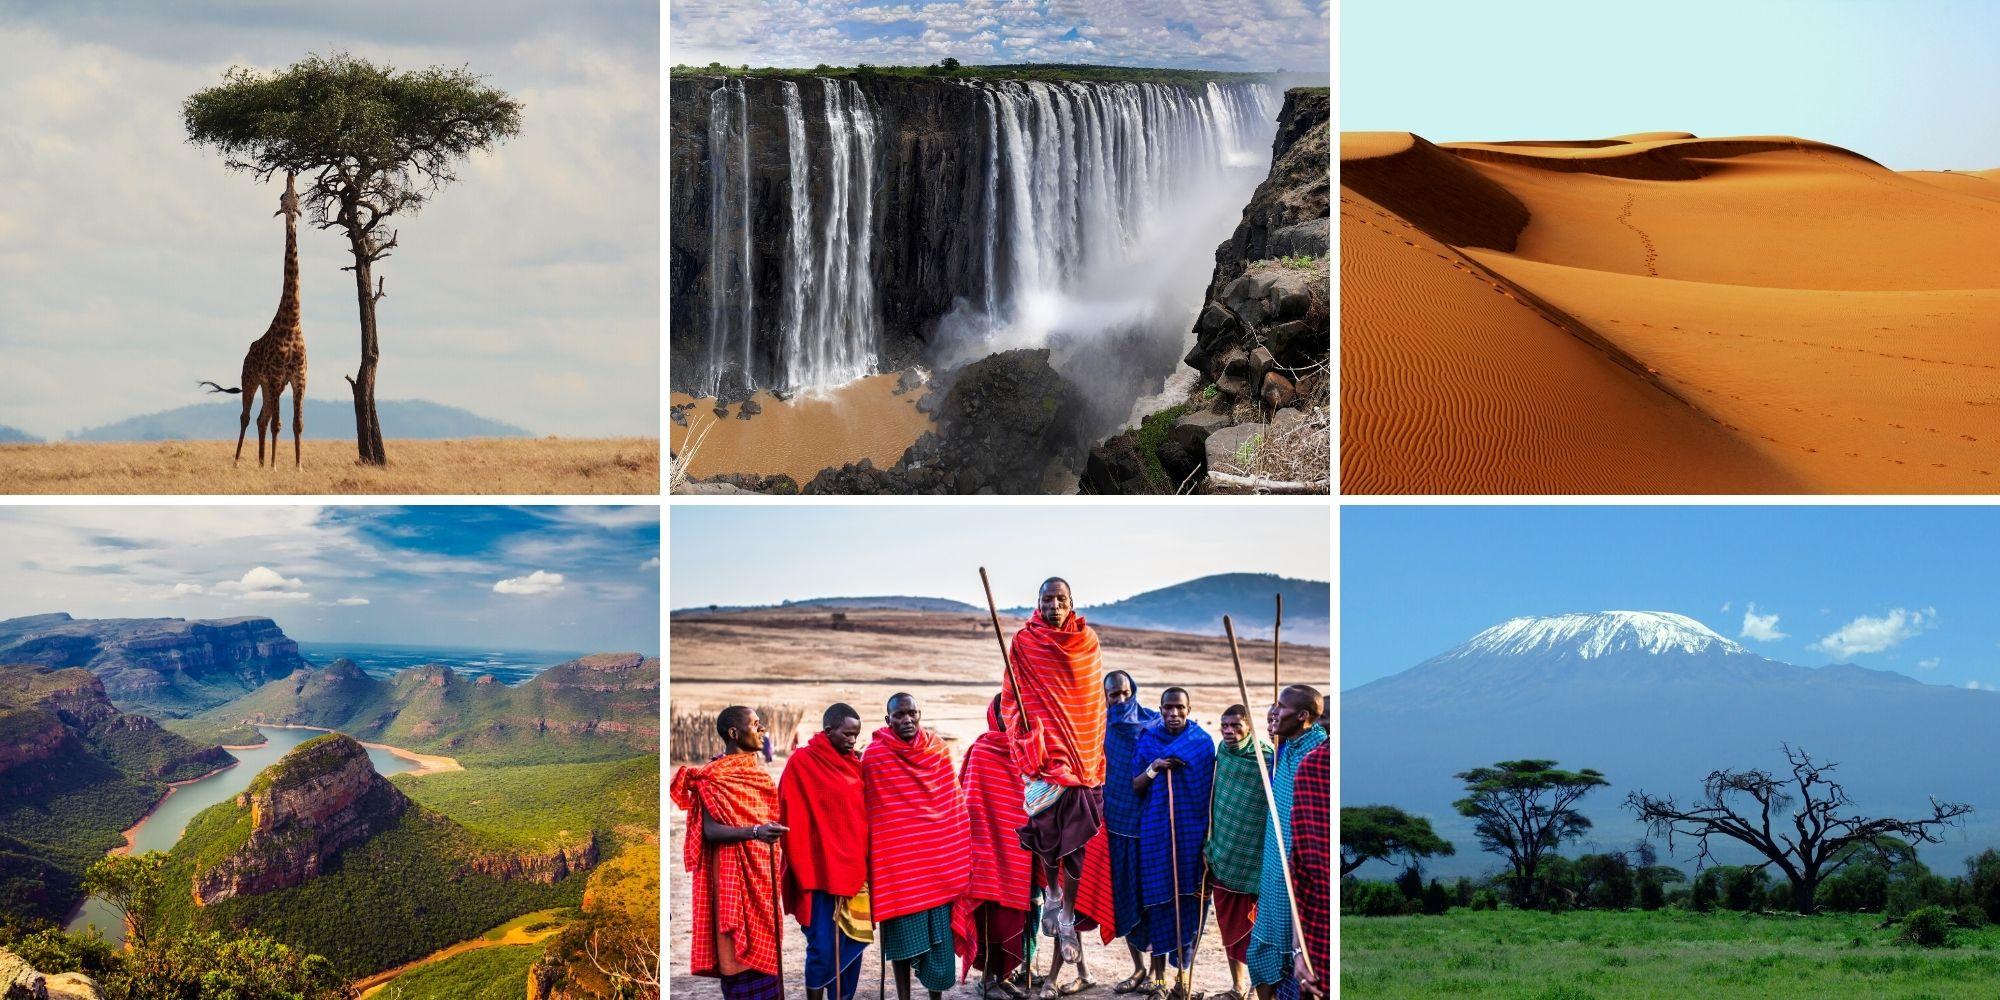 Africa's diversity